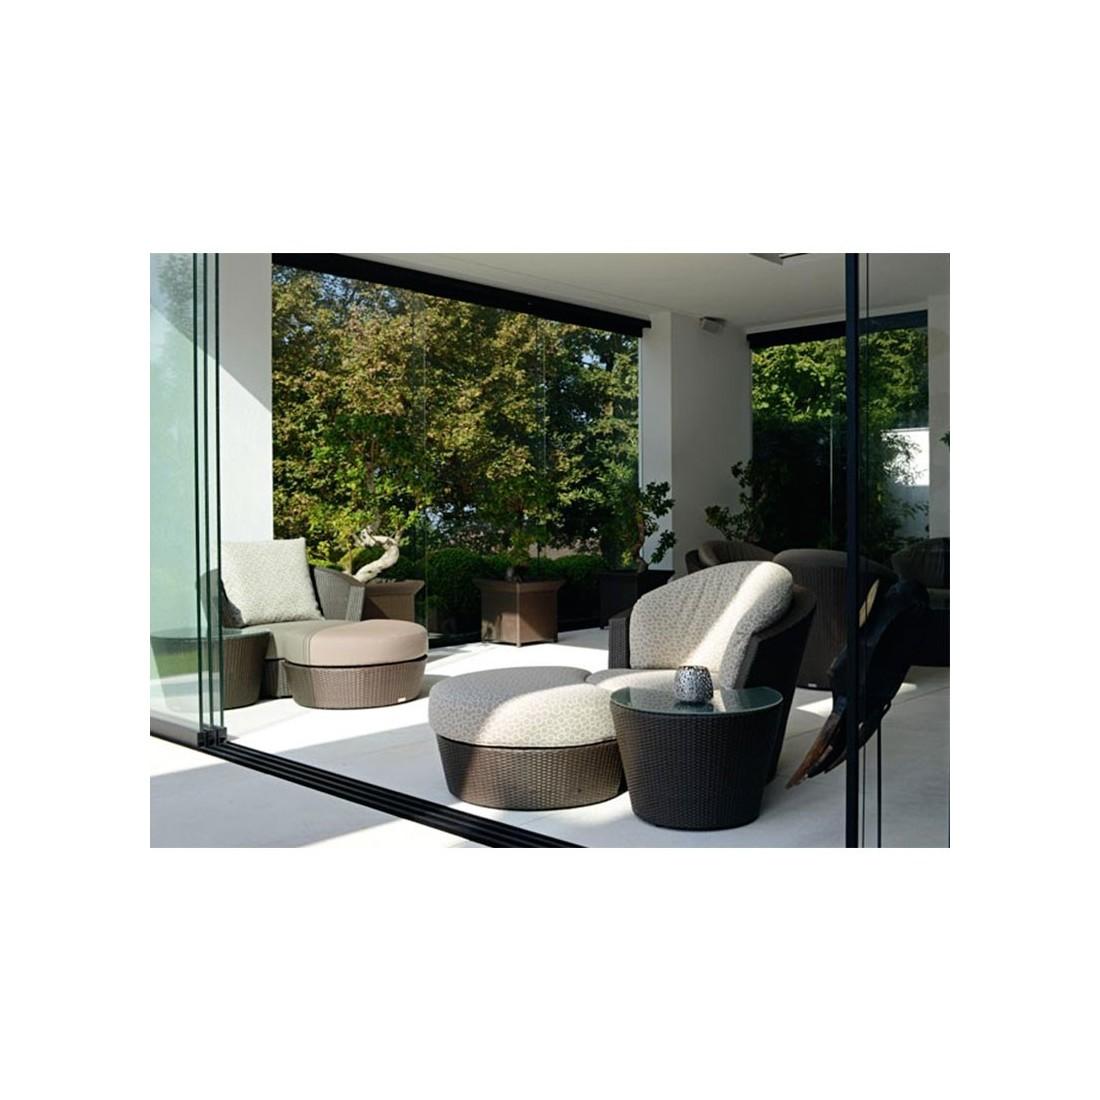 ensemble de salon florida eden roc de rausch. Black Bedroom Furniture Sets. Home Design Ideas